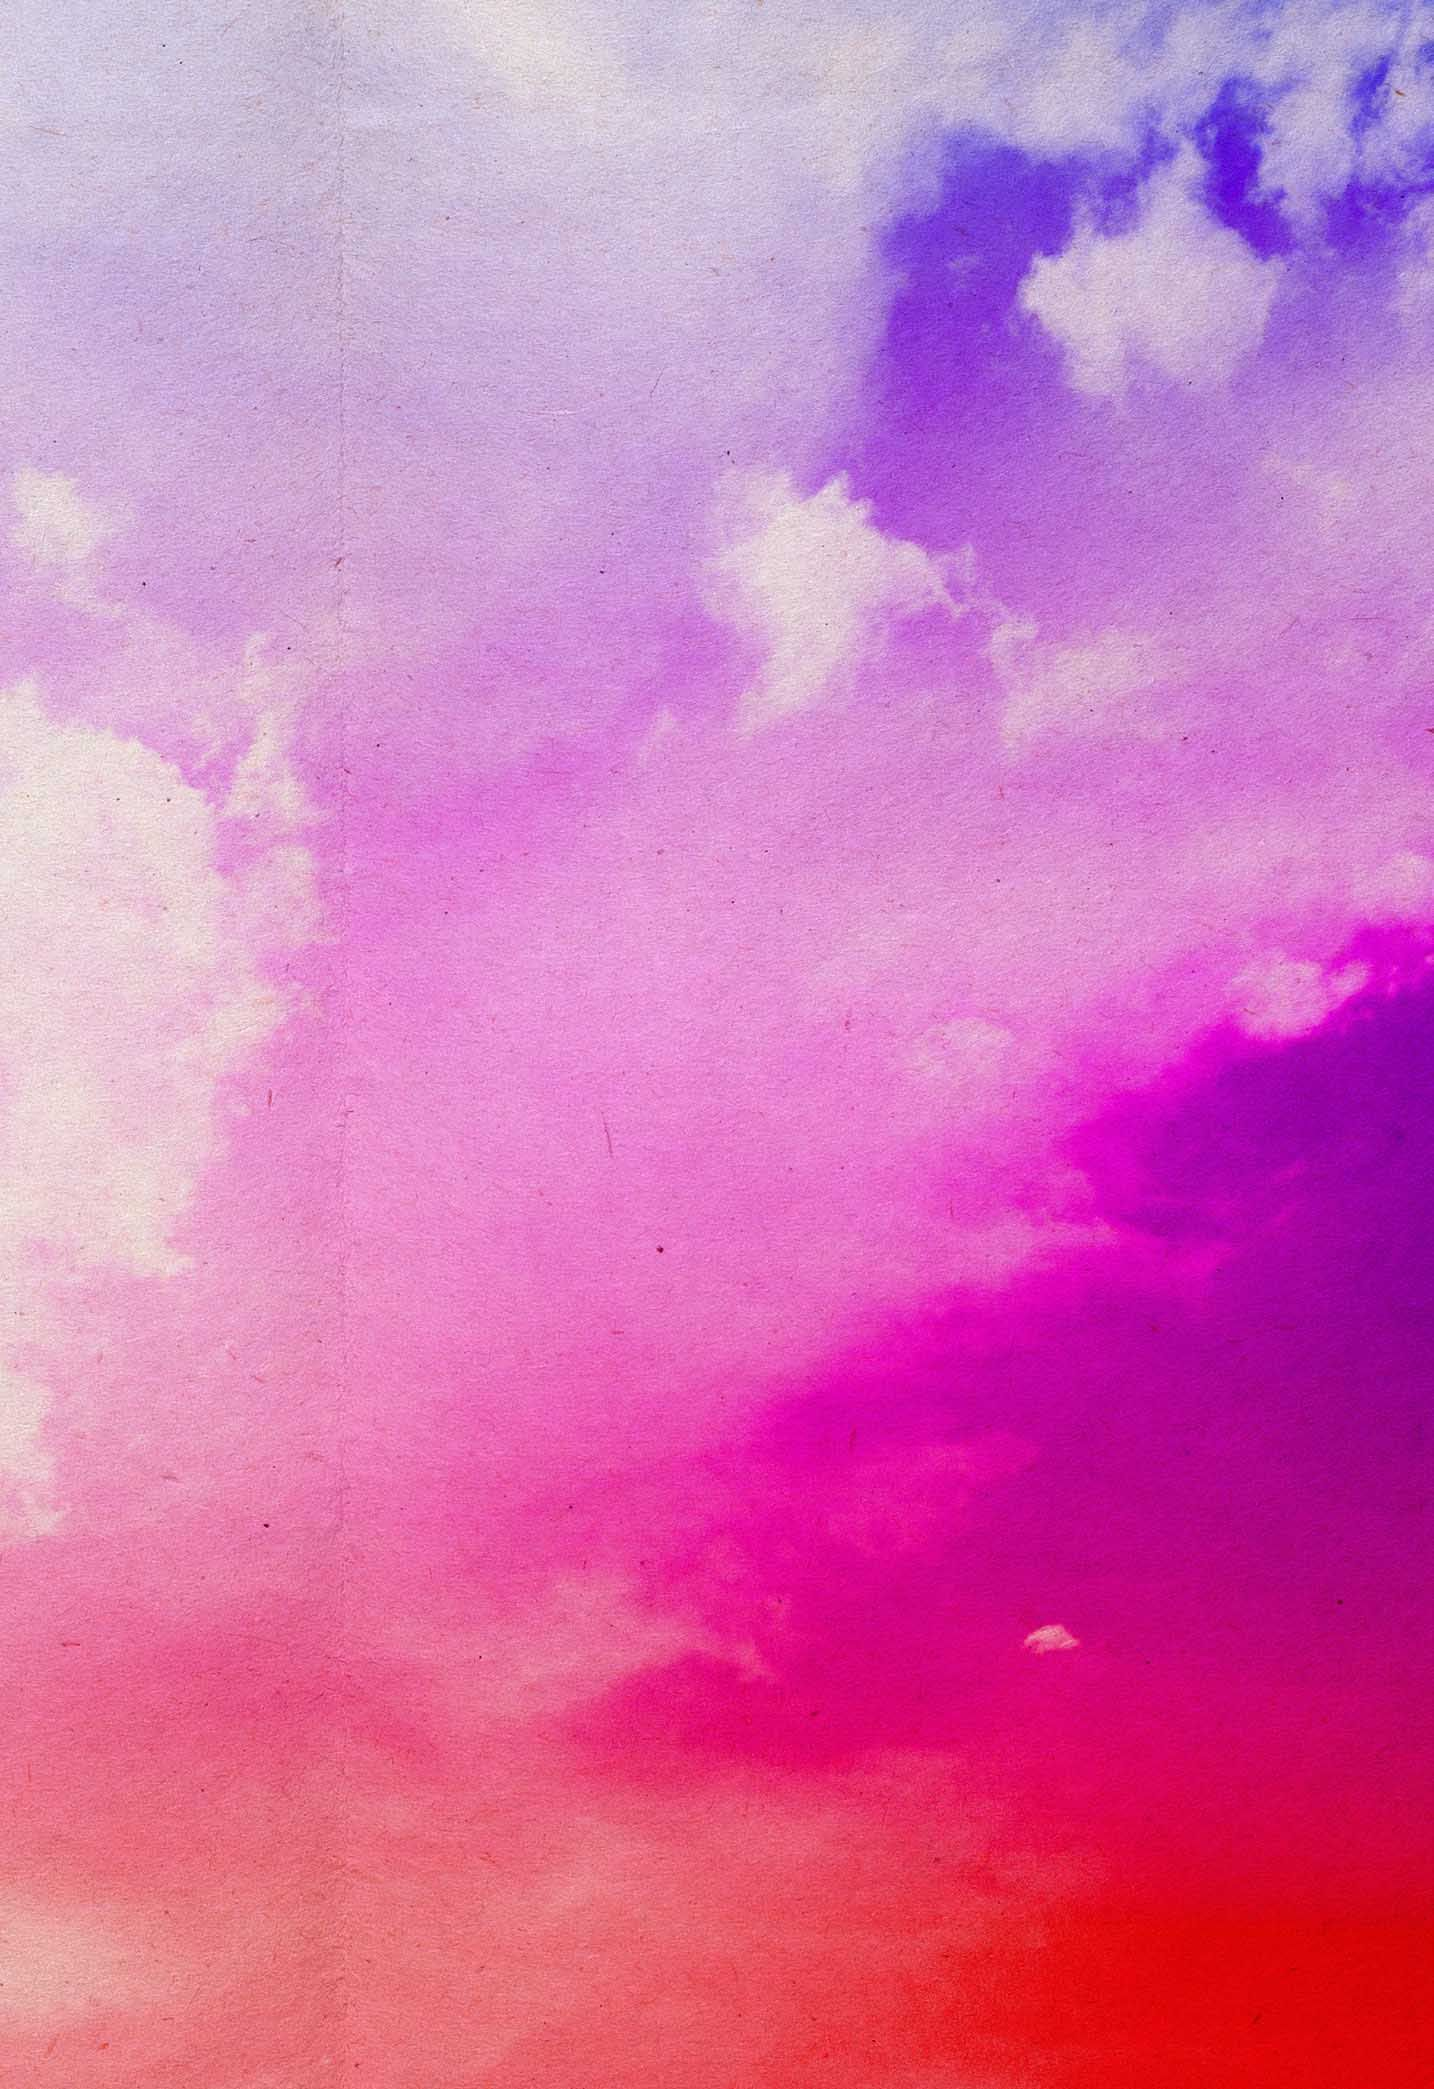 Transici³n rojo a violeta Papeles murales dise±os